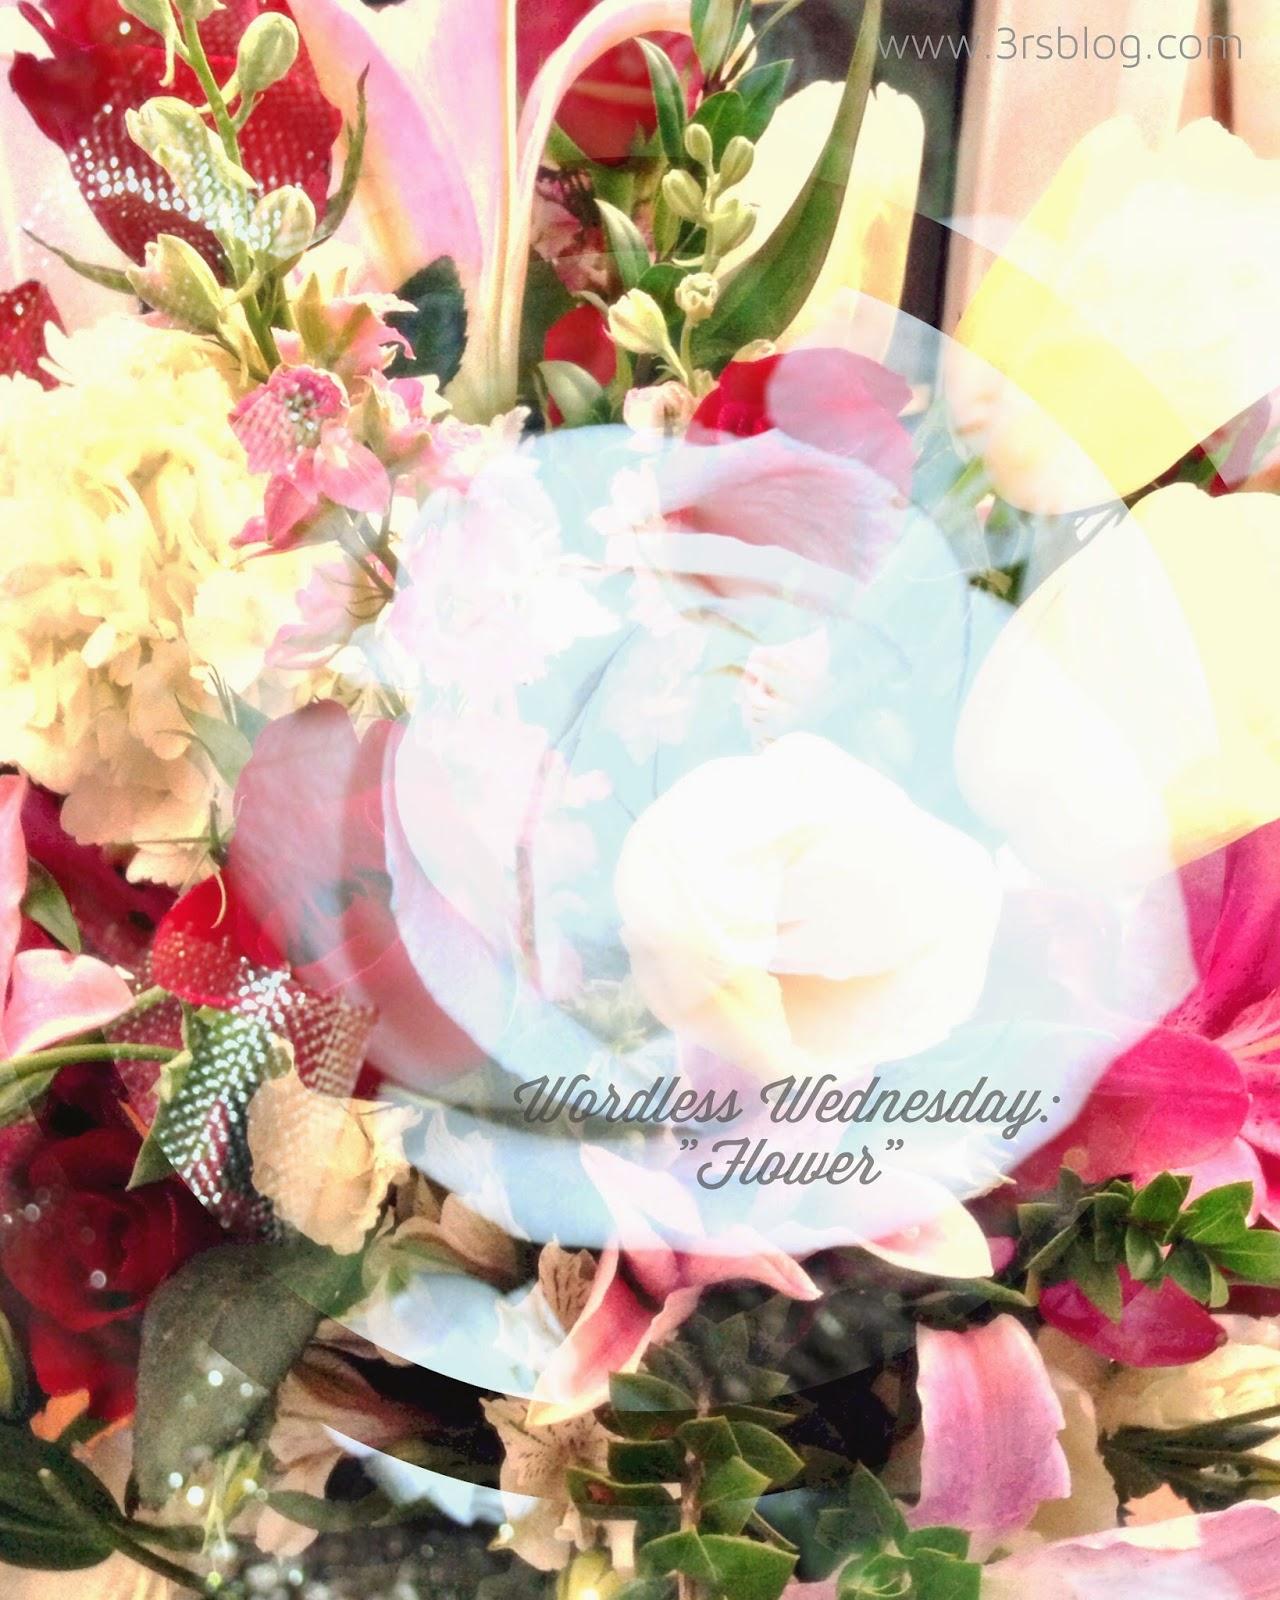 """Flower"" Wordless Wednesday 6/18/2014 on The 3 R's Blog"